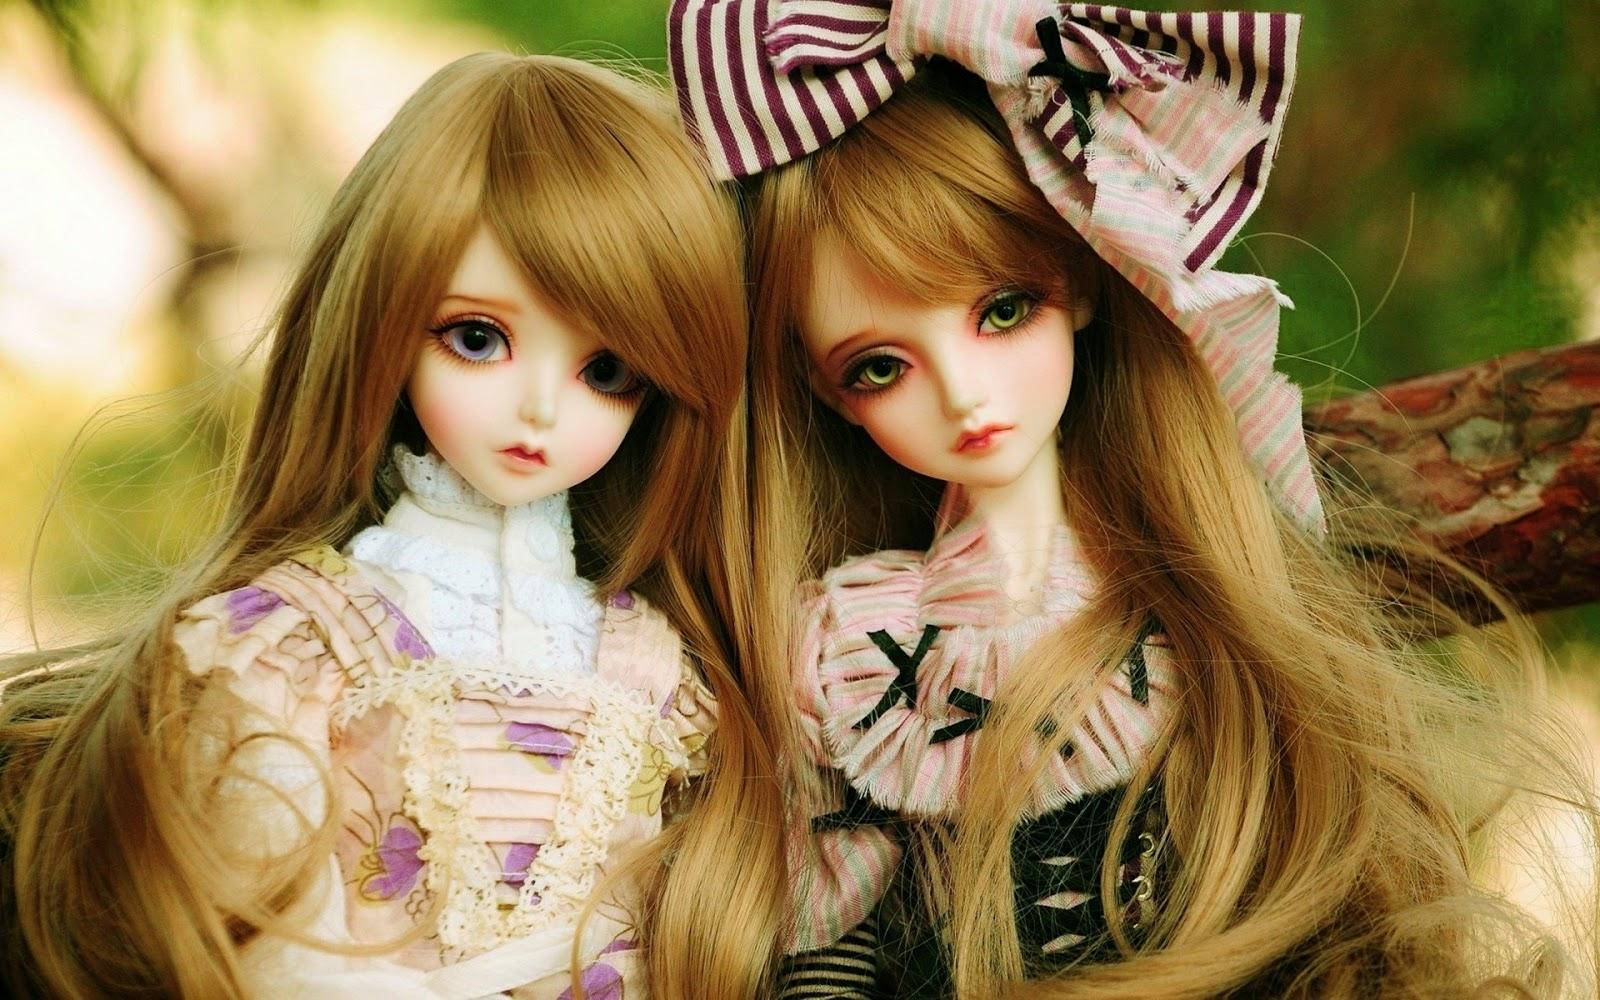 Beautiful dolls hd wallpapers 2018 - Nice doll wallpaper ...